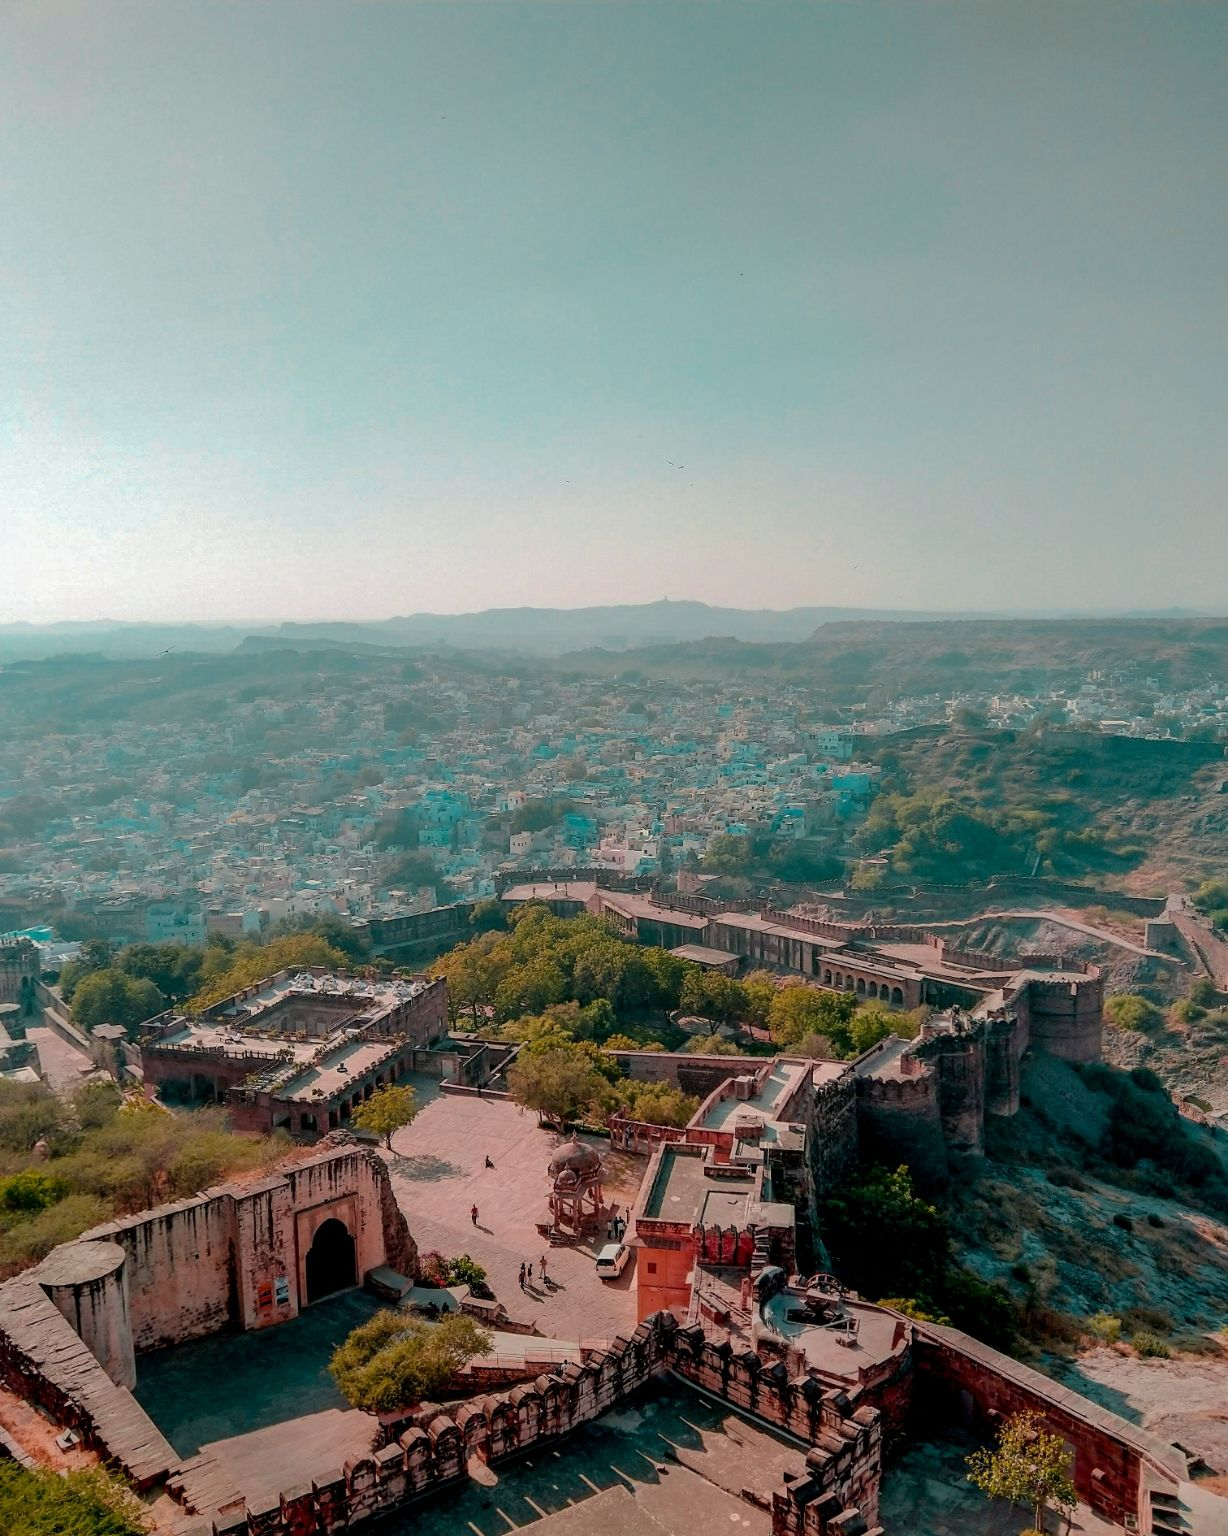 Photo of Mehrangarh Fort Museum By Shashwat Sangal